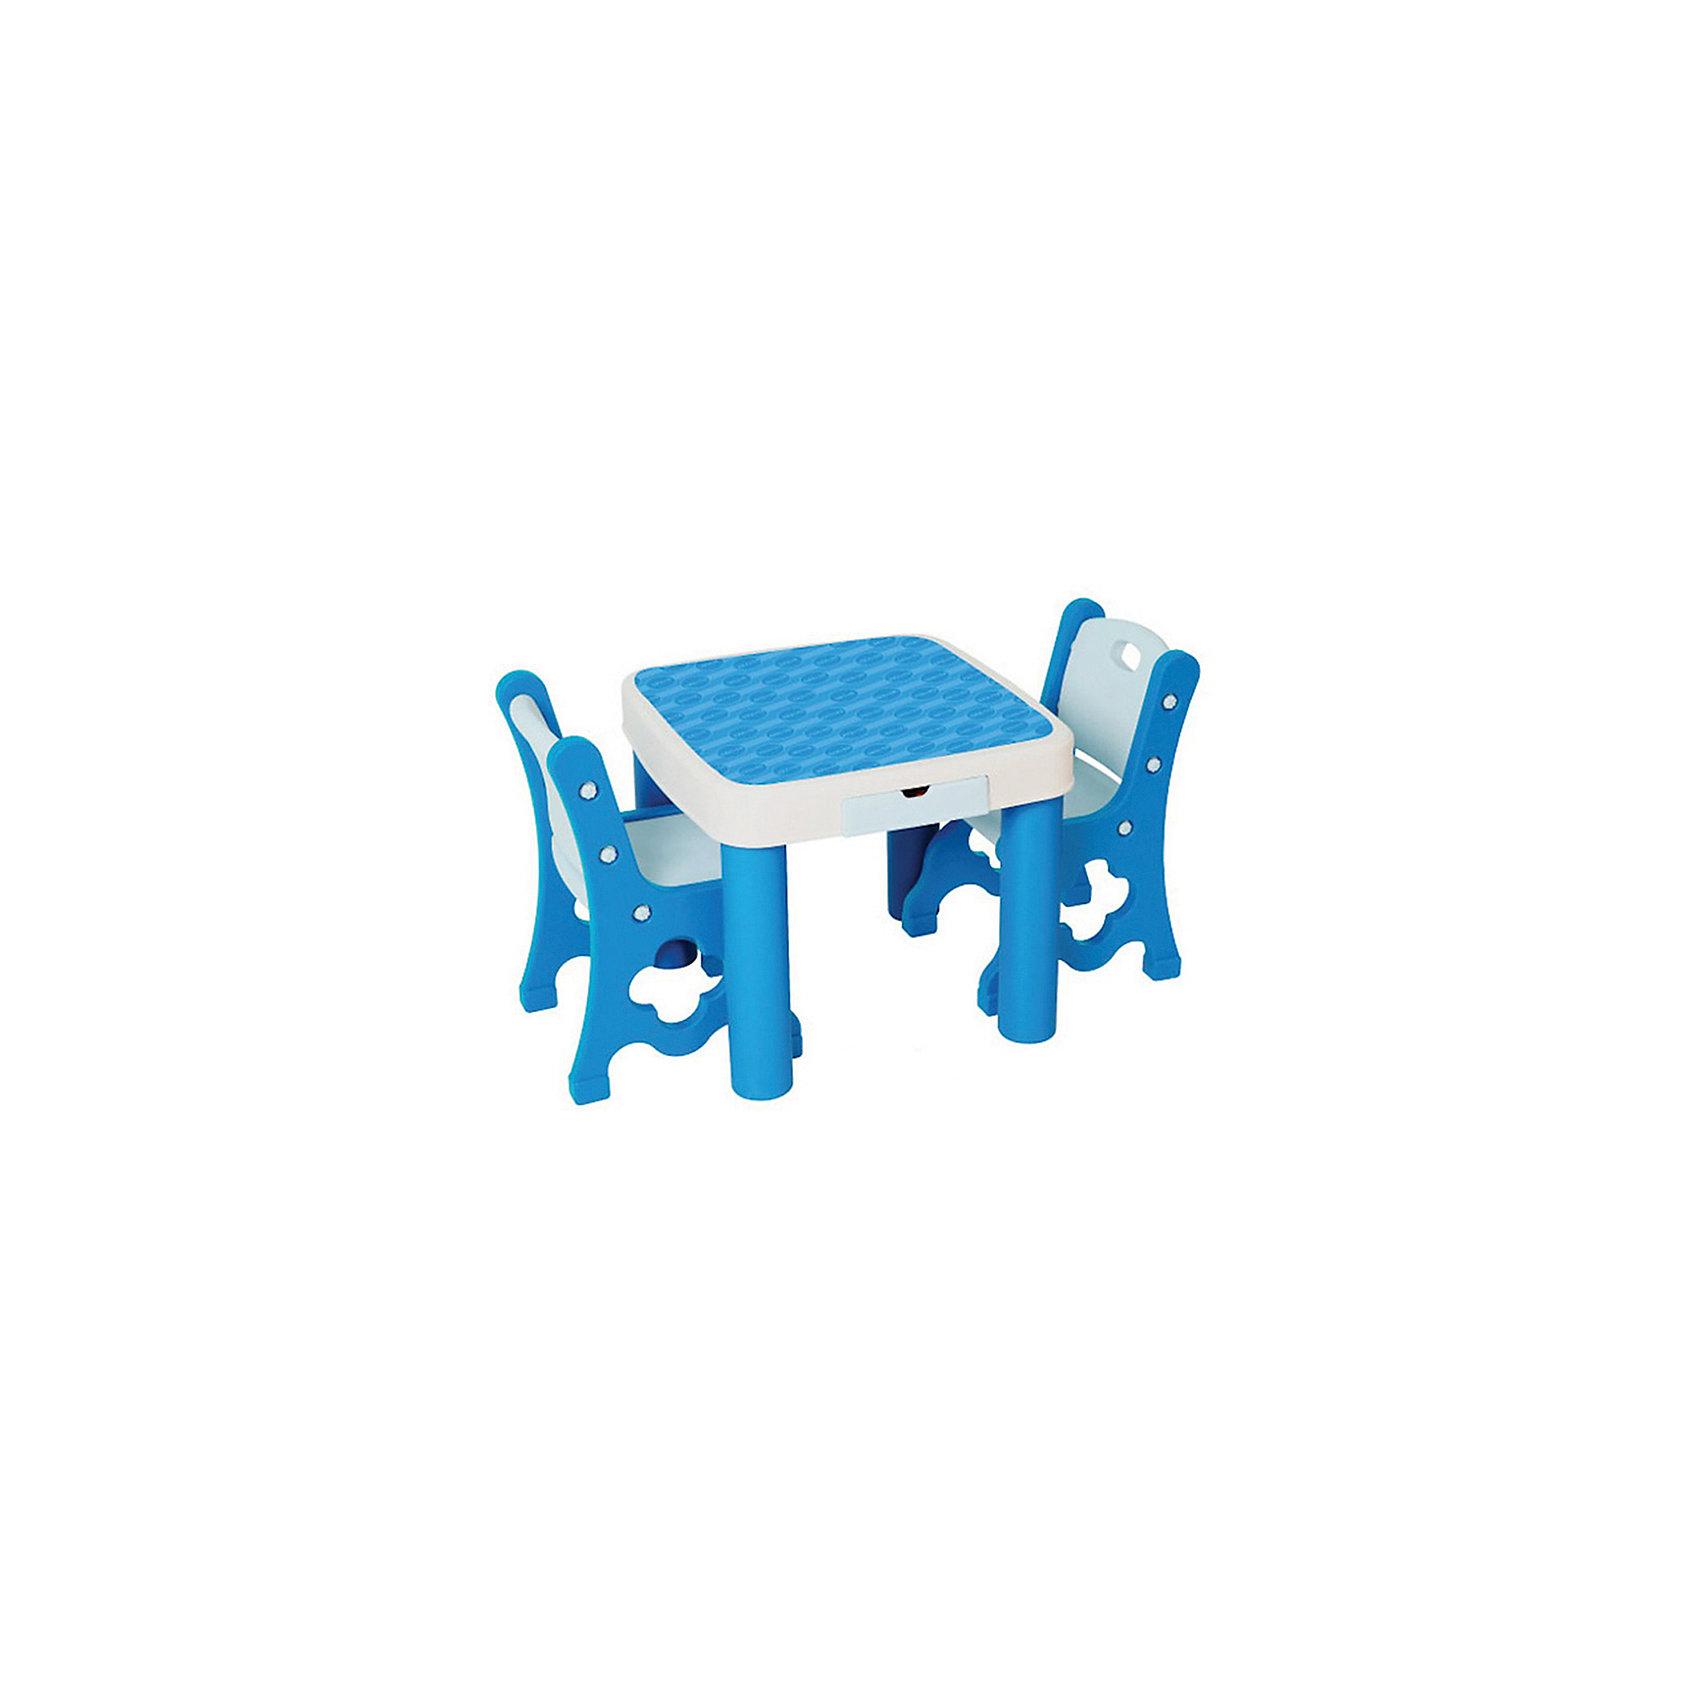 Набор: стол+стул, Eduplay, голубойМебель<br>EDU PLAY Набор Стол+стул голубой (60х60х52h) (34x28x60h)<br><br>Ширина мм: 665<br>Глубина мм: 630<br>Высота мм: 265<br>Вес г: 9500<br>Возраст от месяцев: 36<br>Возраст до месяцев: 60<br>Пол: Унисекс<br>Возраст: Детский<br>SKU: 5500240